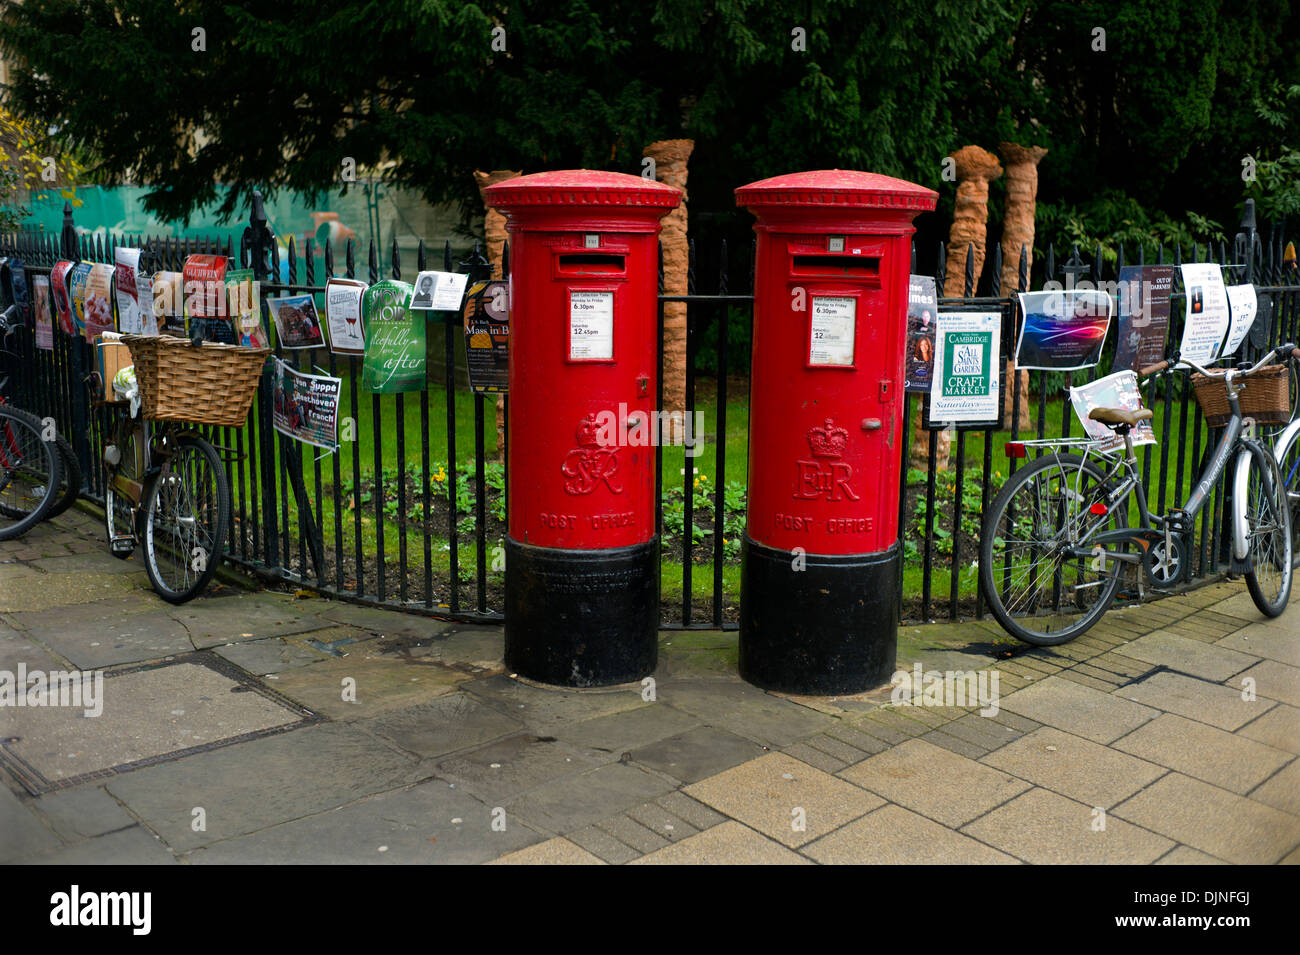 Cambridge Post Boxes, Cambridge England, UK. 11-2013 - Stock Image